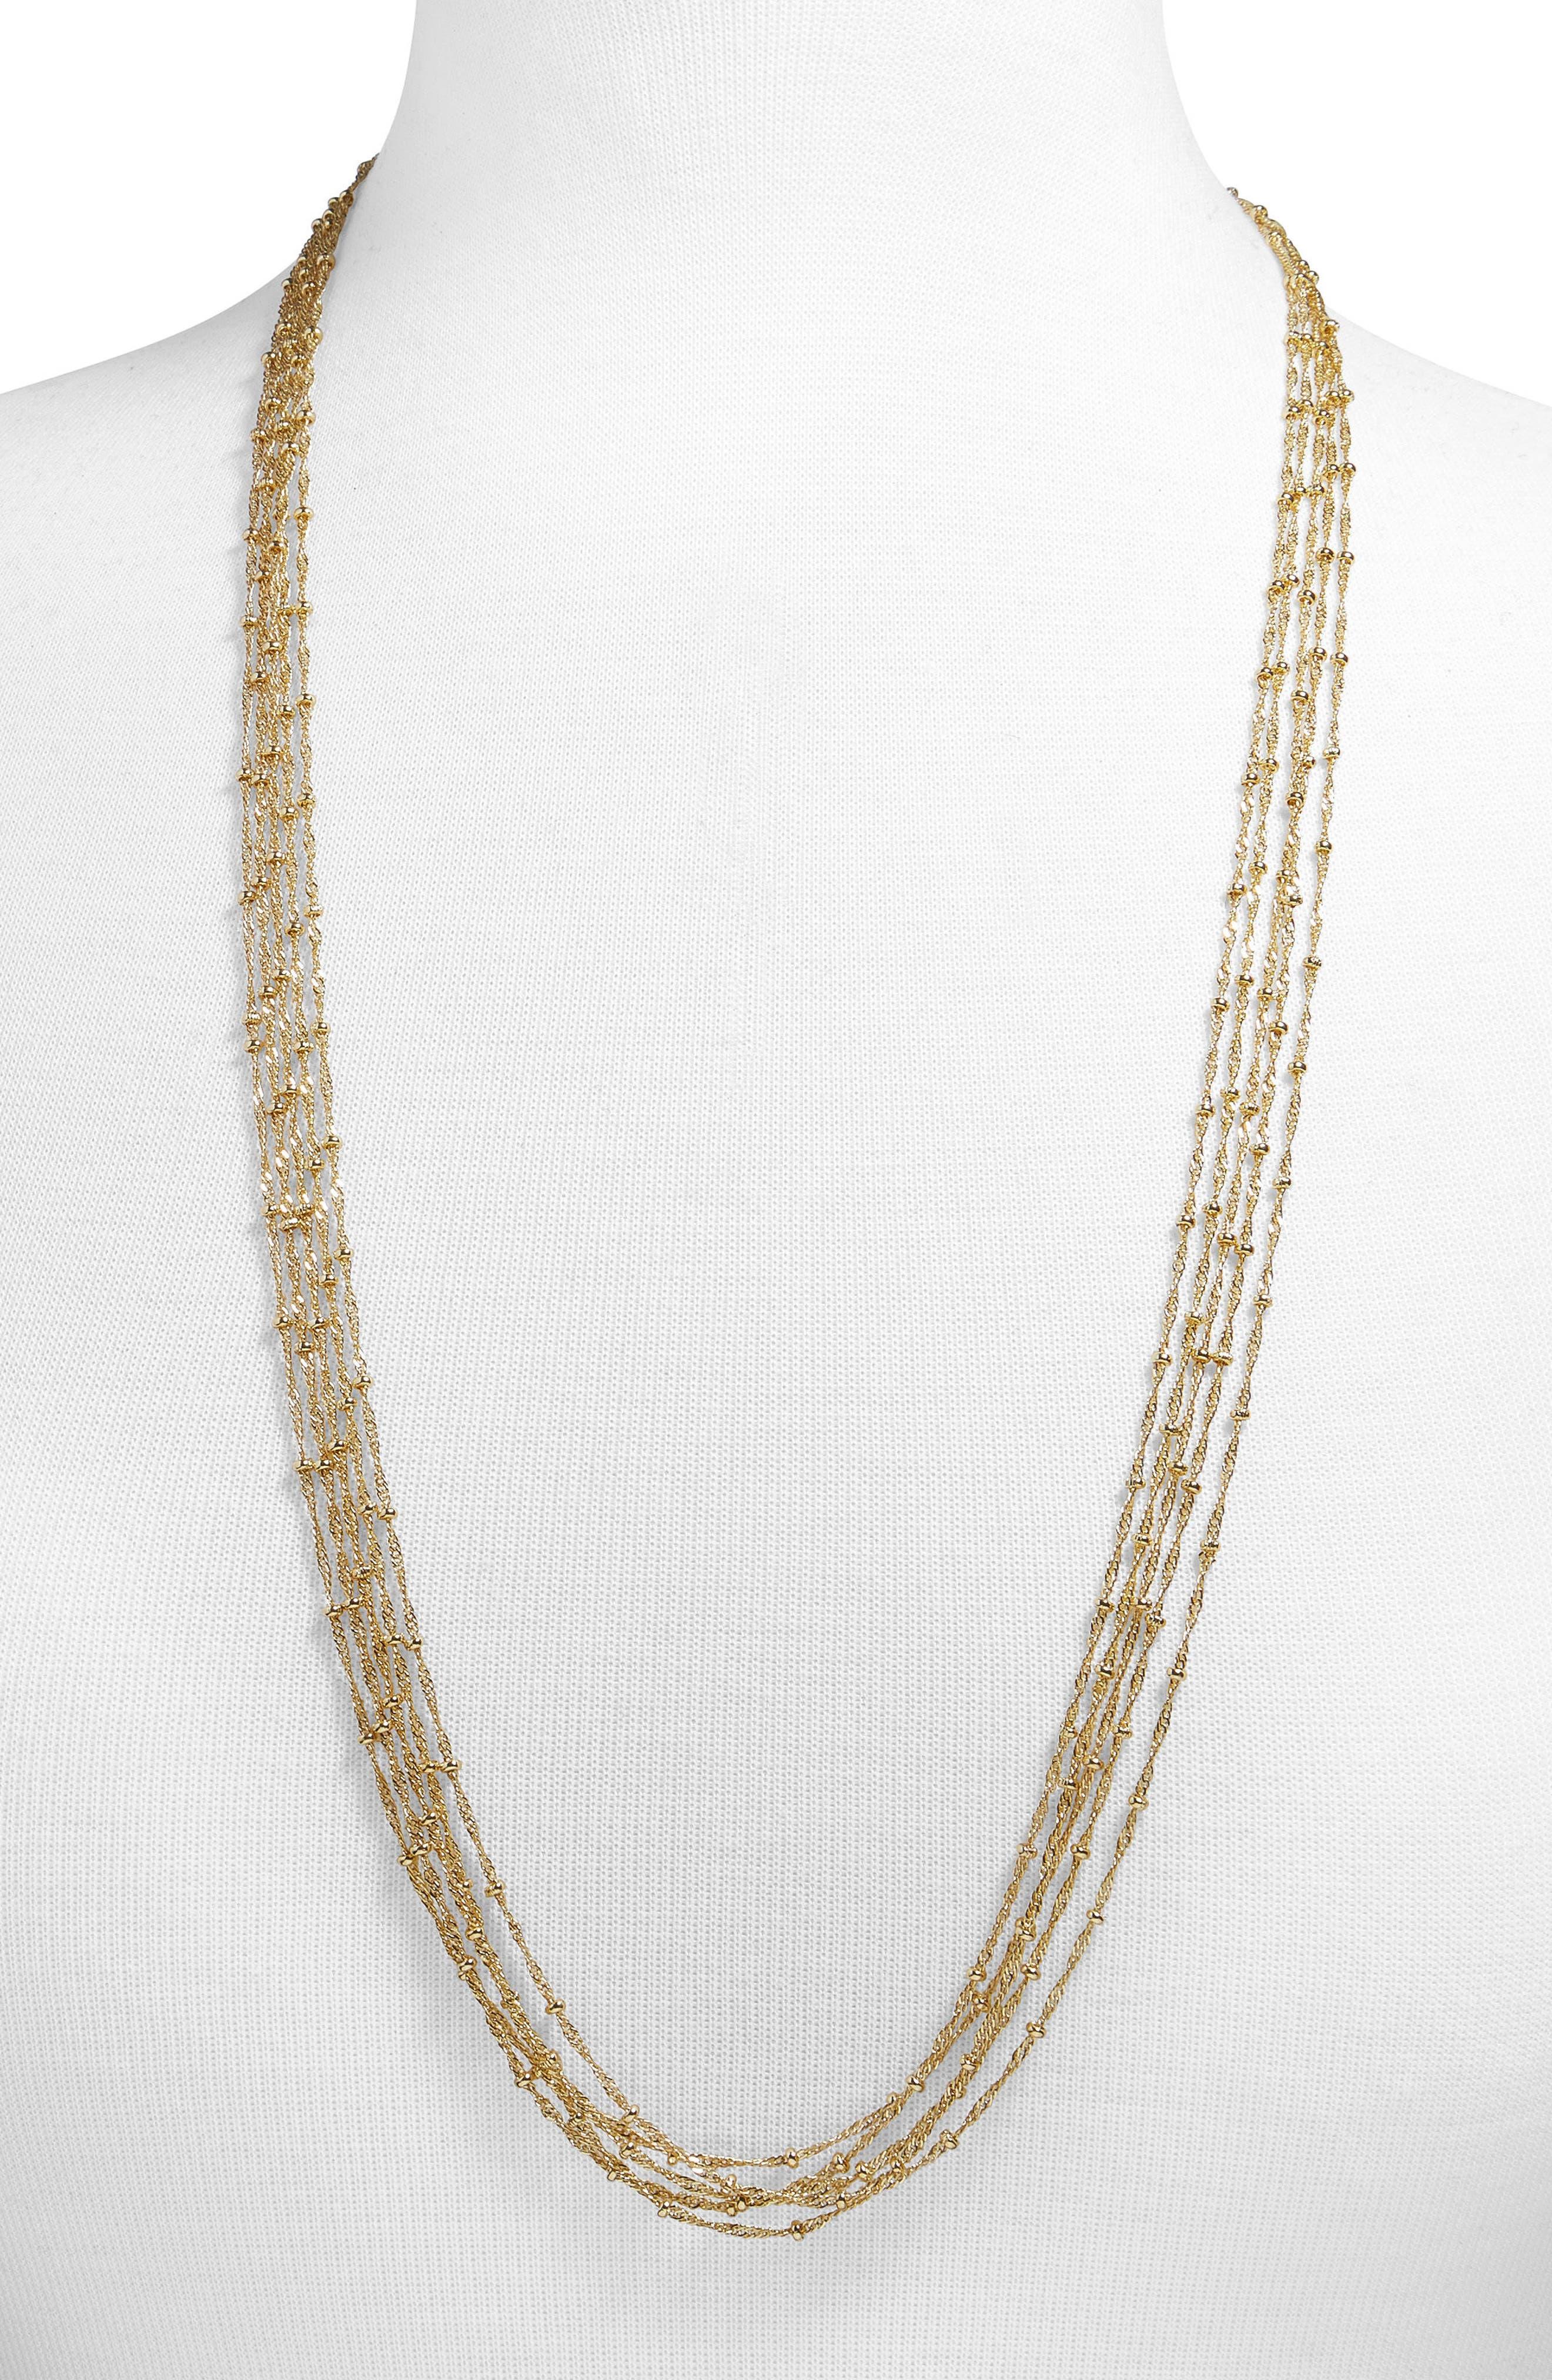 Daphnee Necklace,                             Main thumbnail 1, color,                             Gold